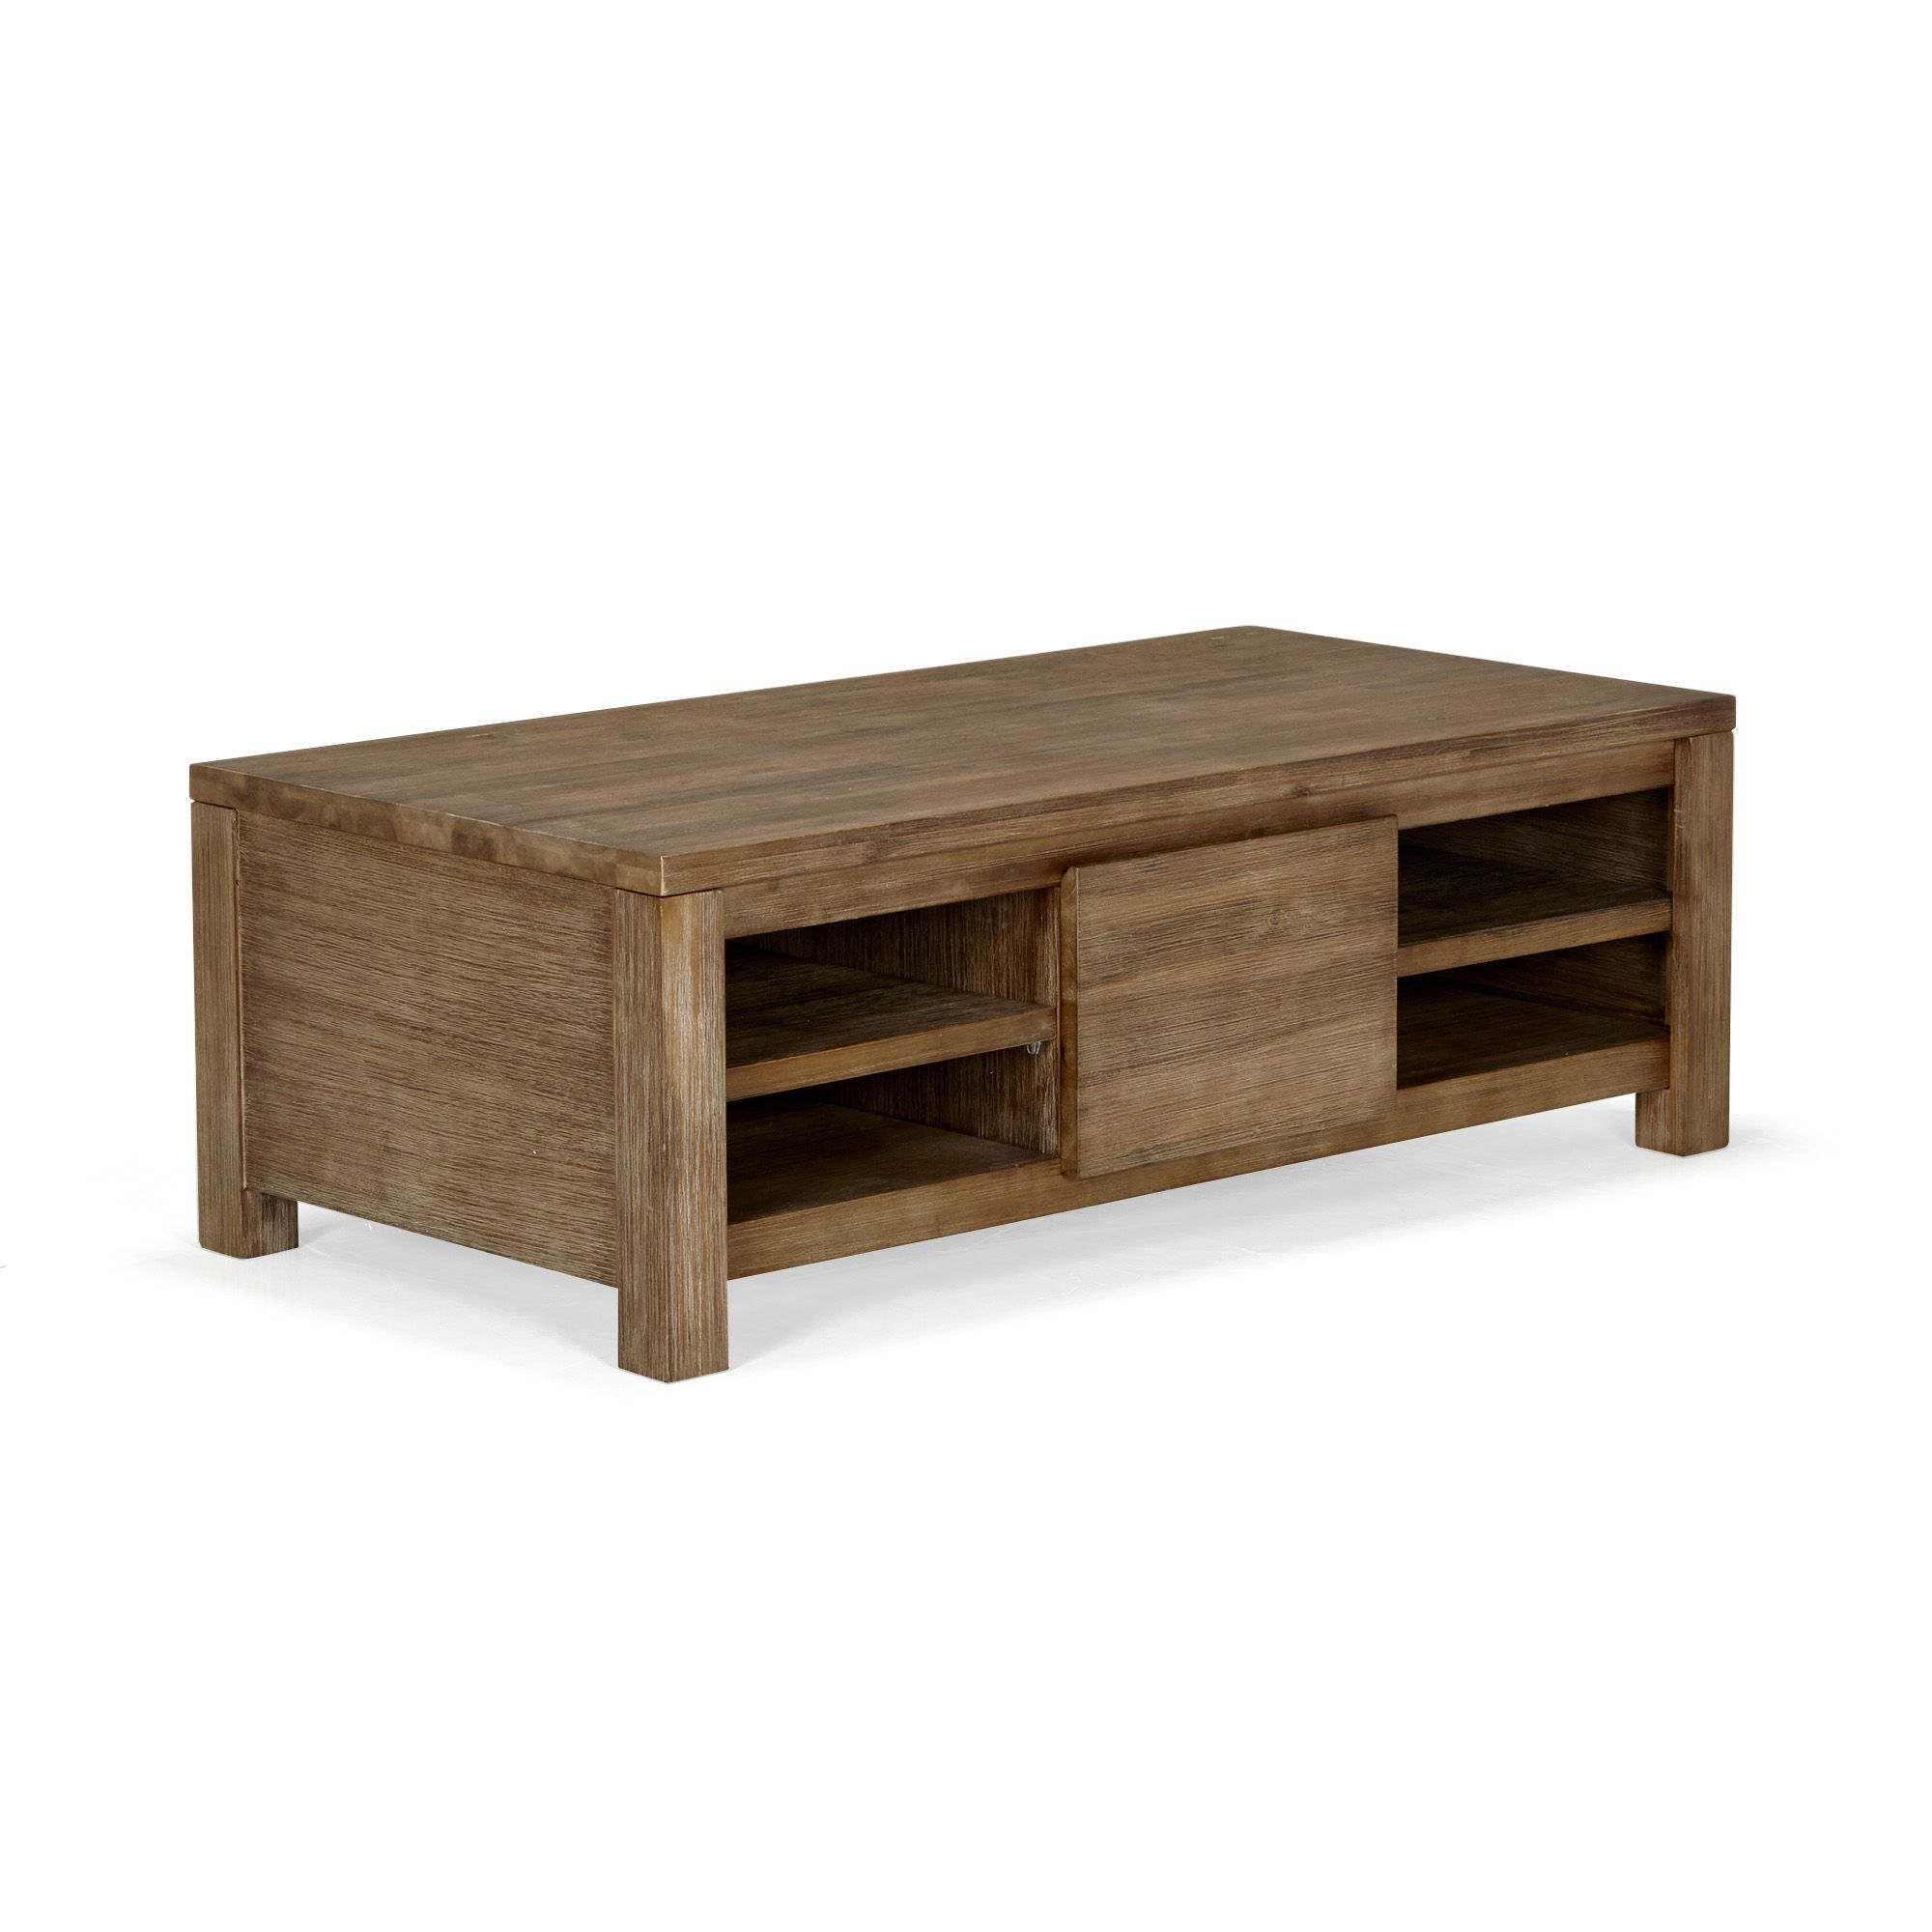 44981b1c8b86323a09512c4596cb6168 Luxe De Mini Table Basse Concept